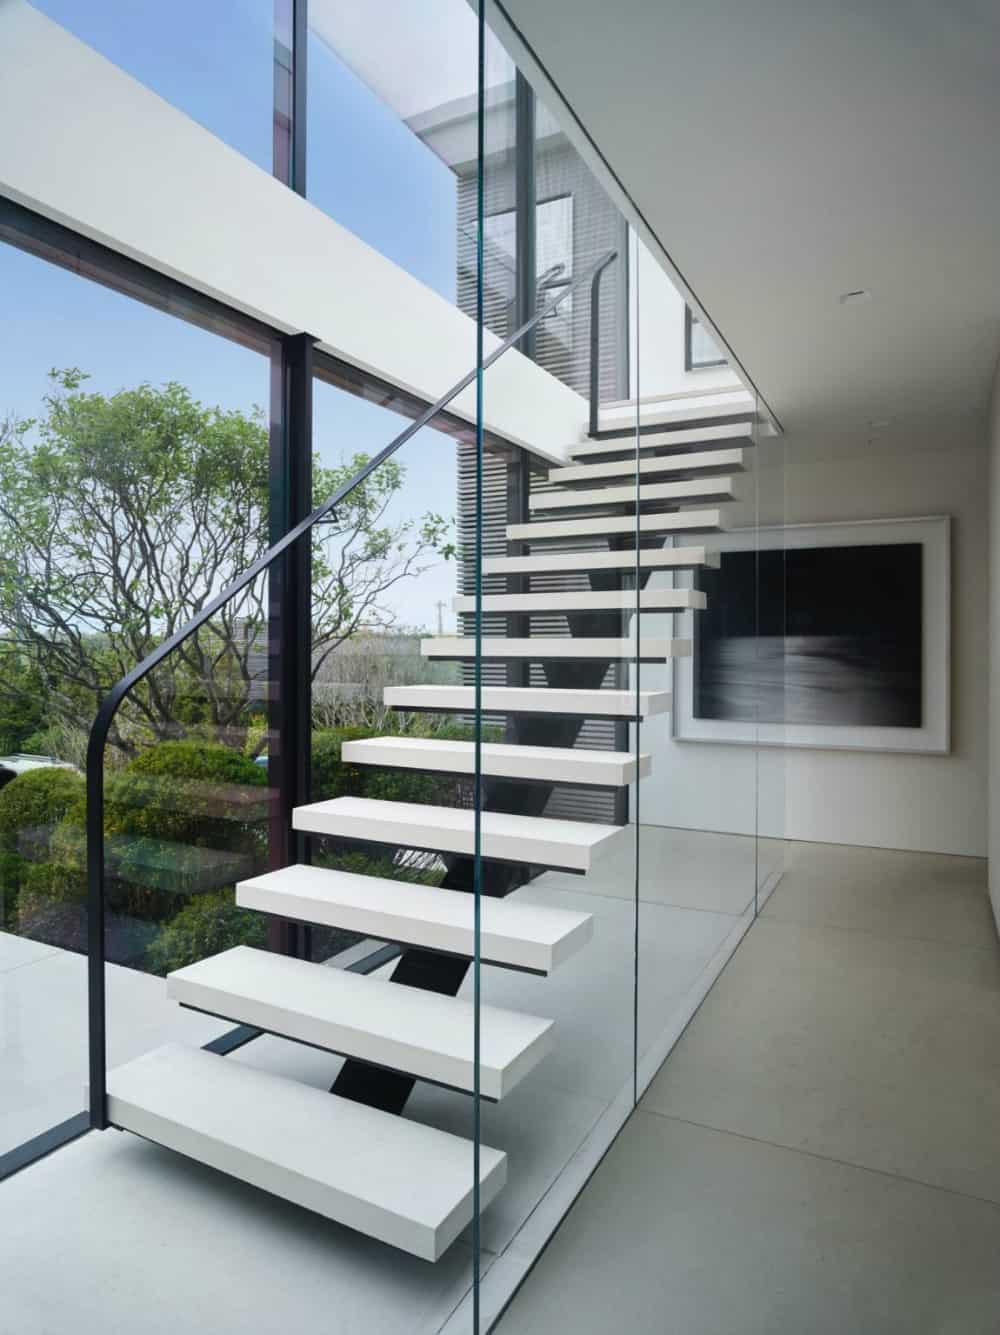 Glass wall opens up to immediate greenery